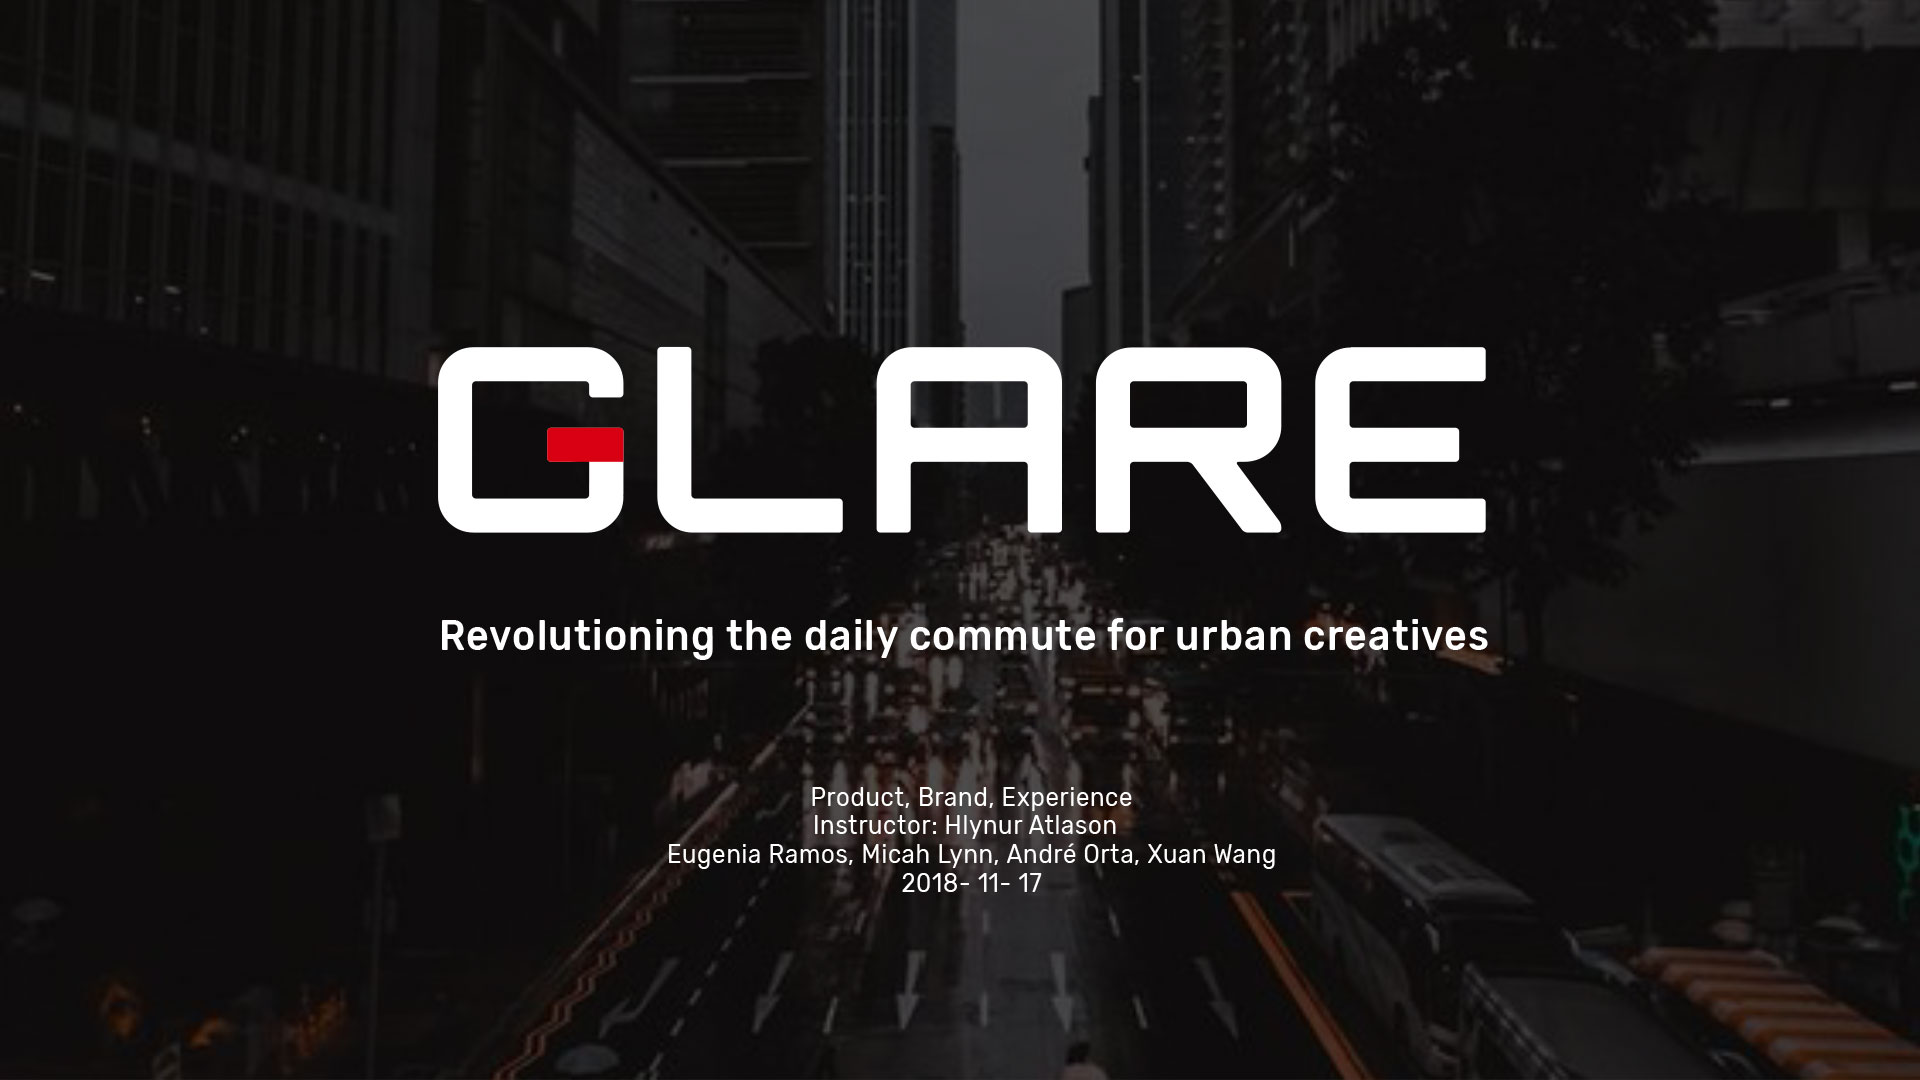 Glare-final-presentation-11-21-(dragged)-1.jpg